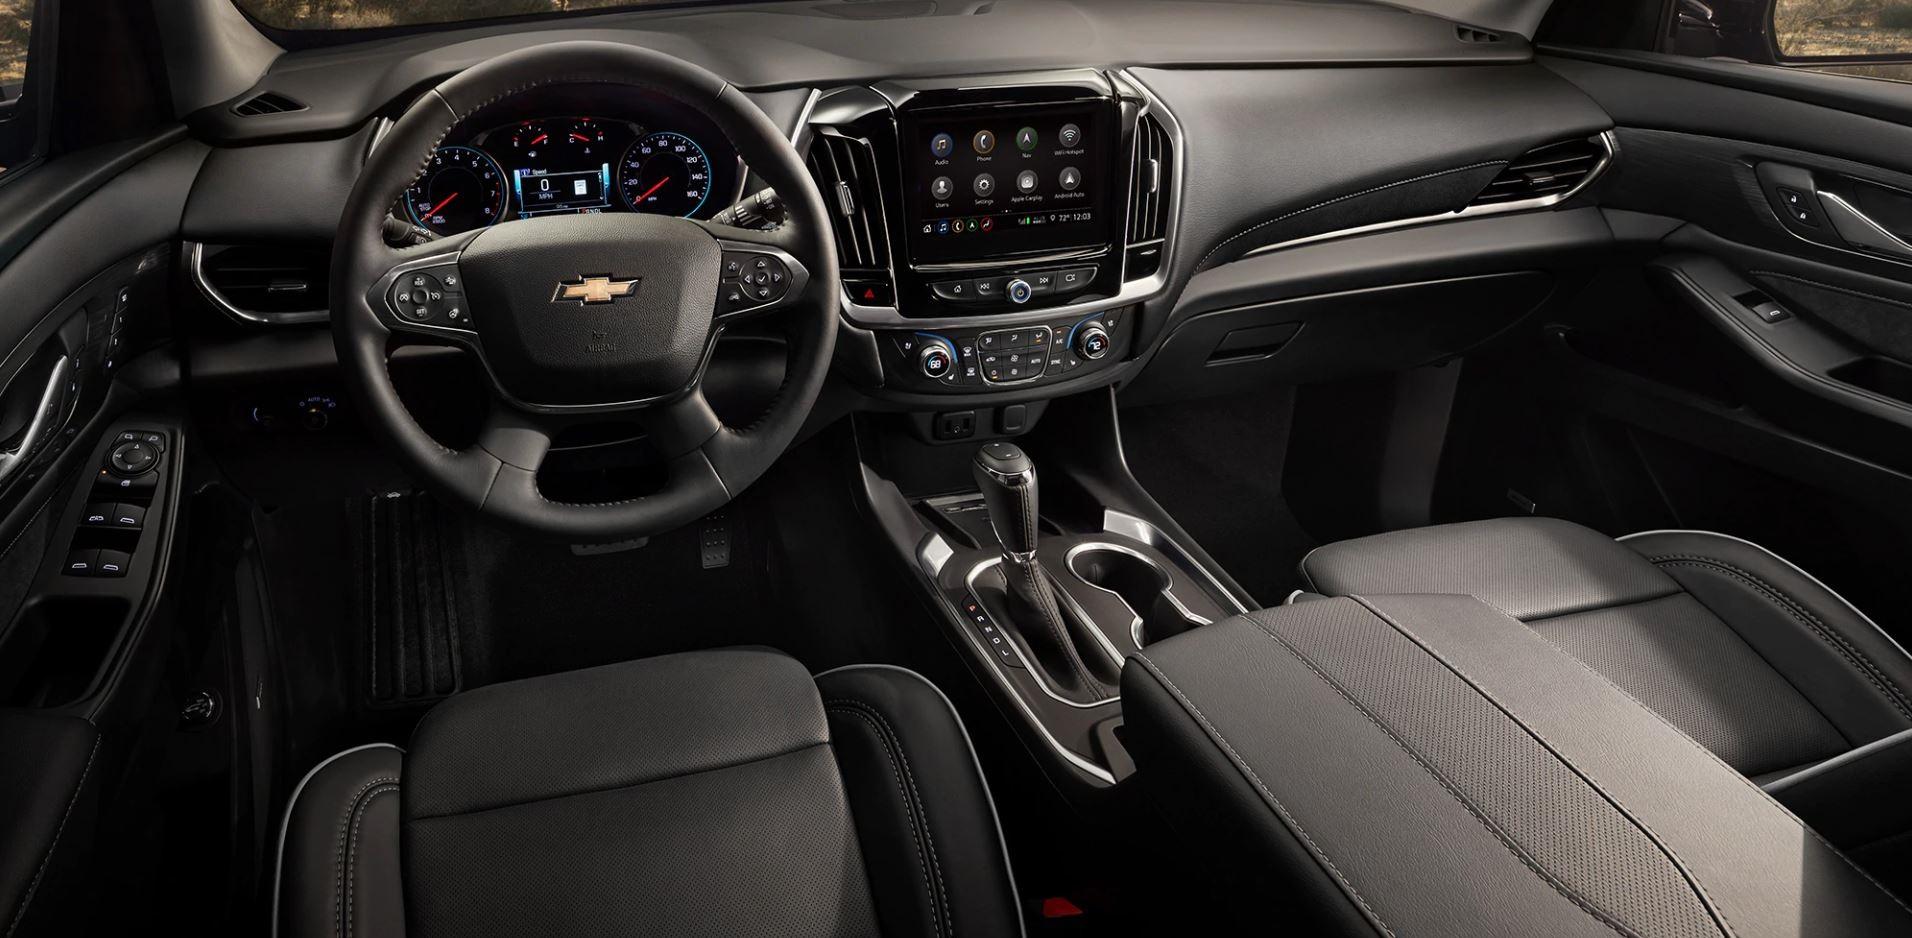 2020 Chevrolet Traverse Cockpit